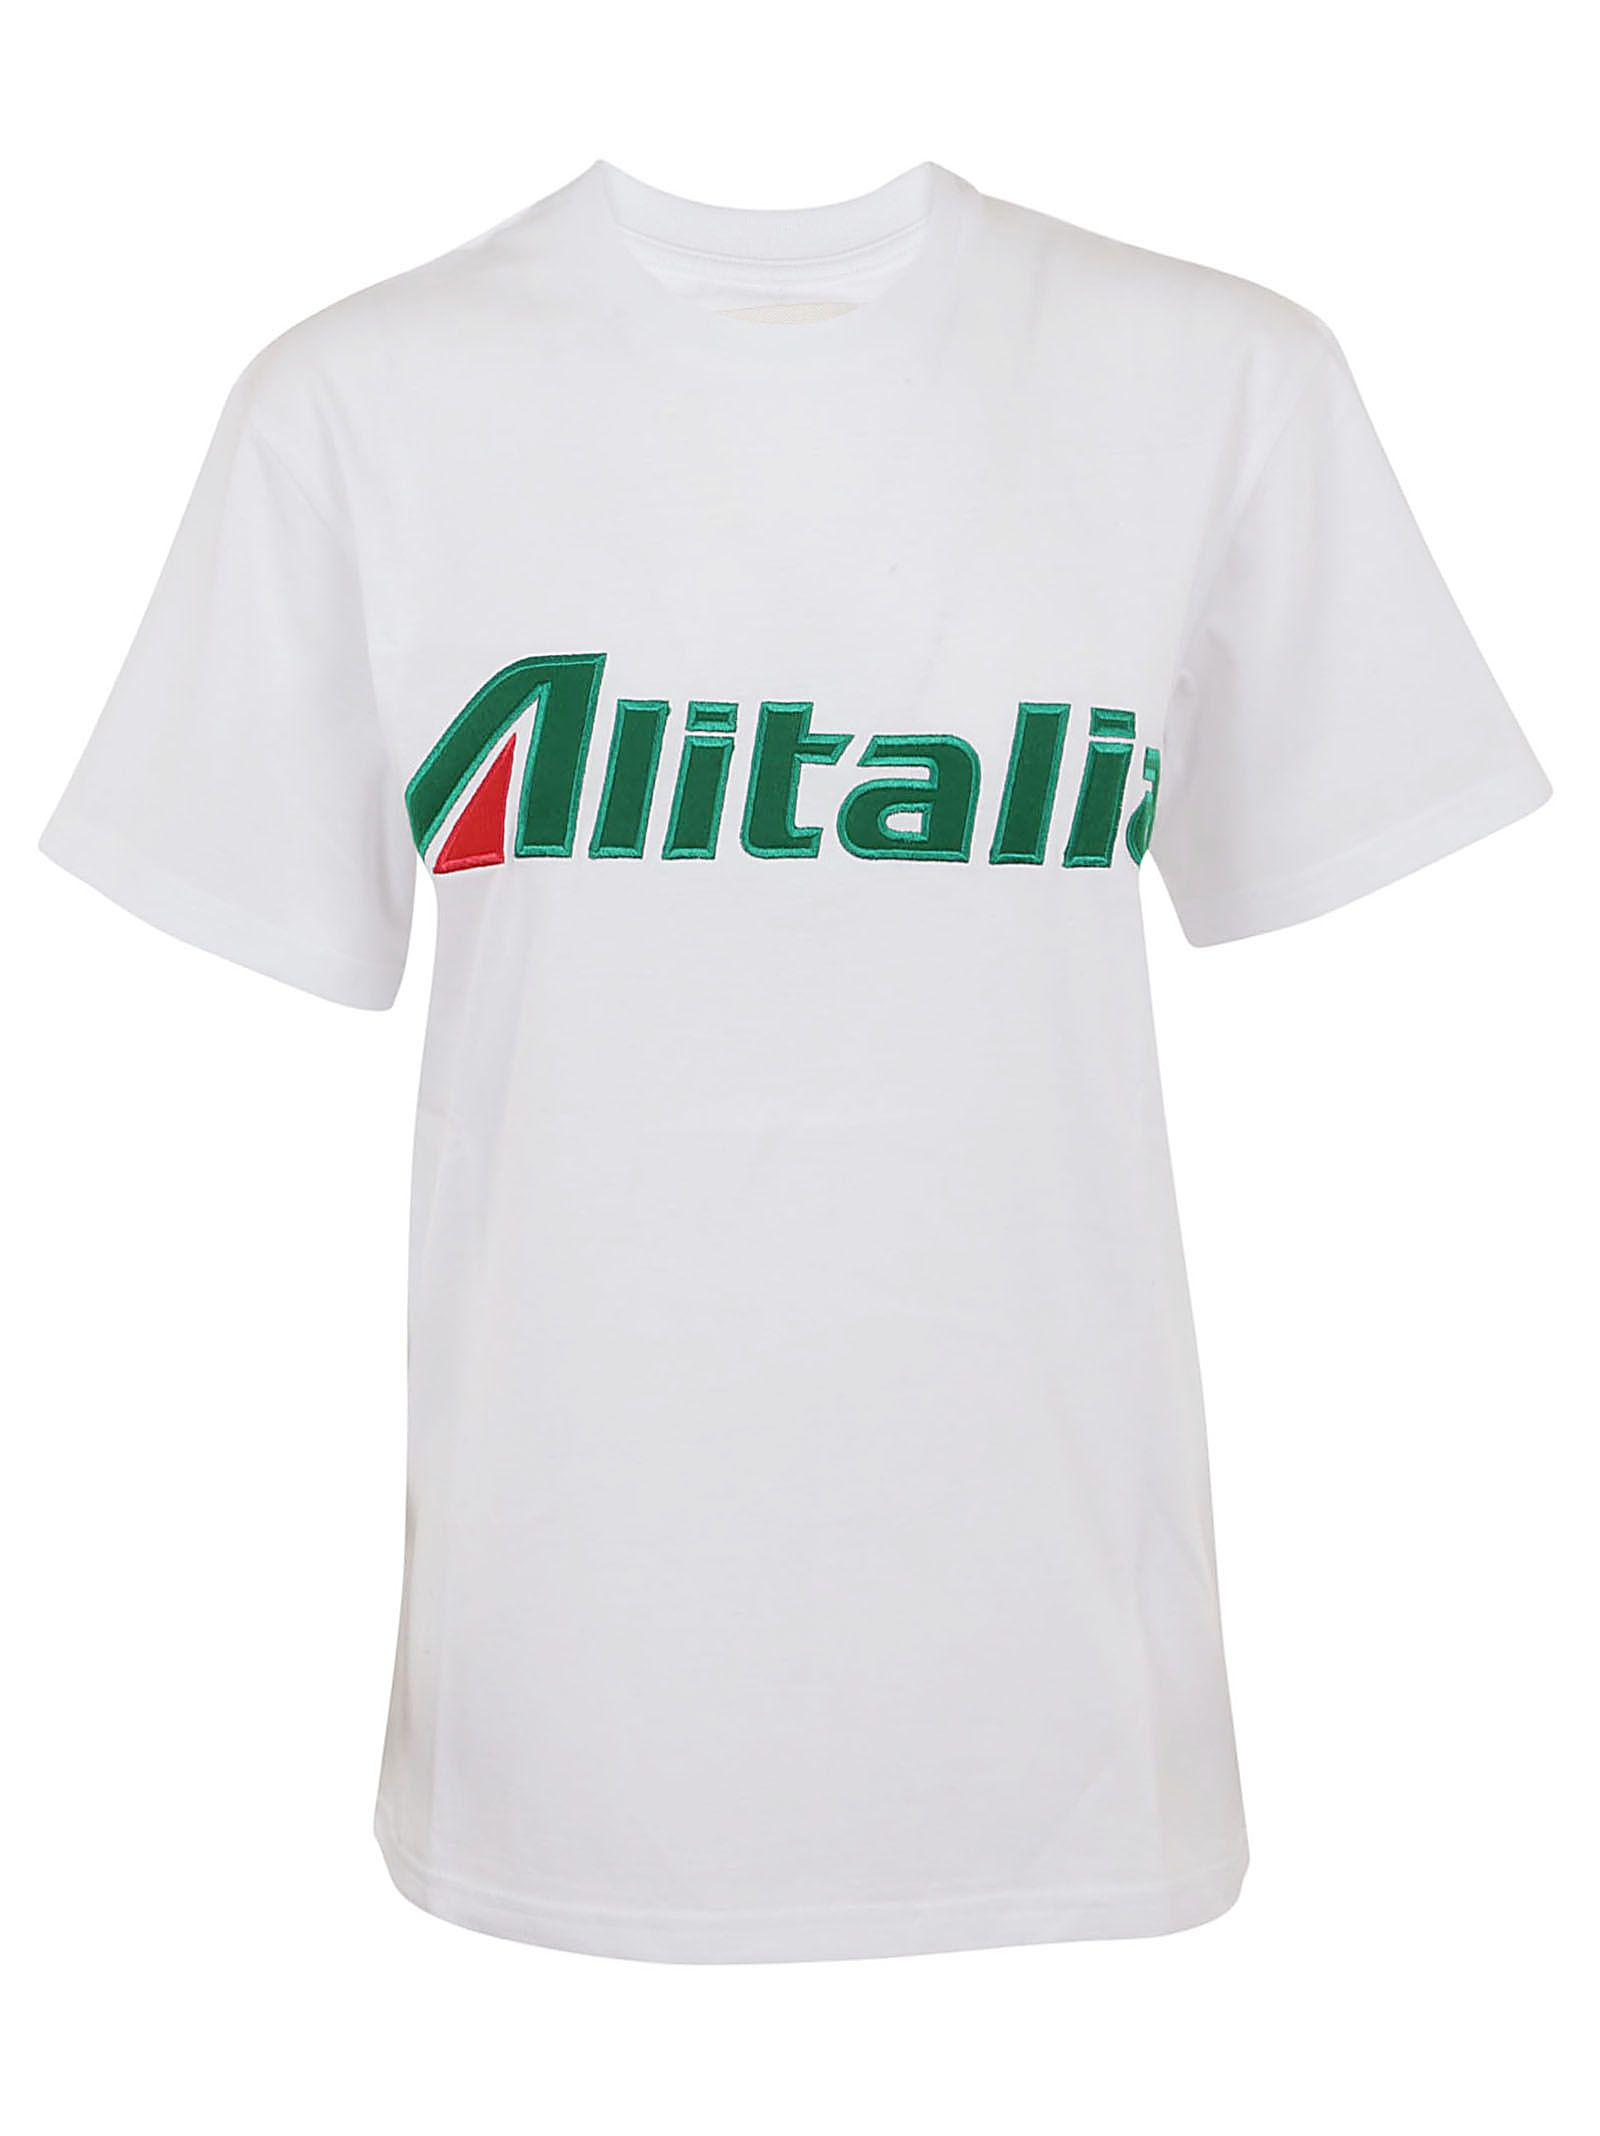 Alberta Ferretti Alitalia T-shirt